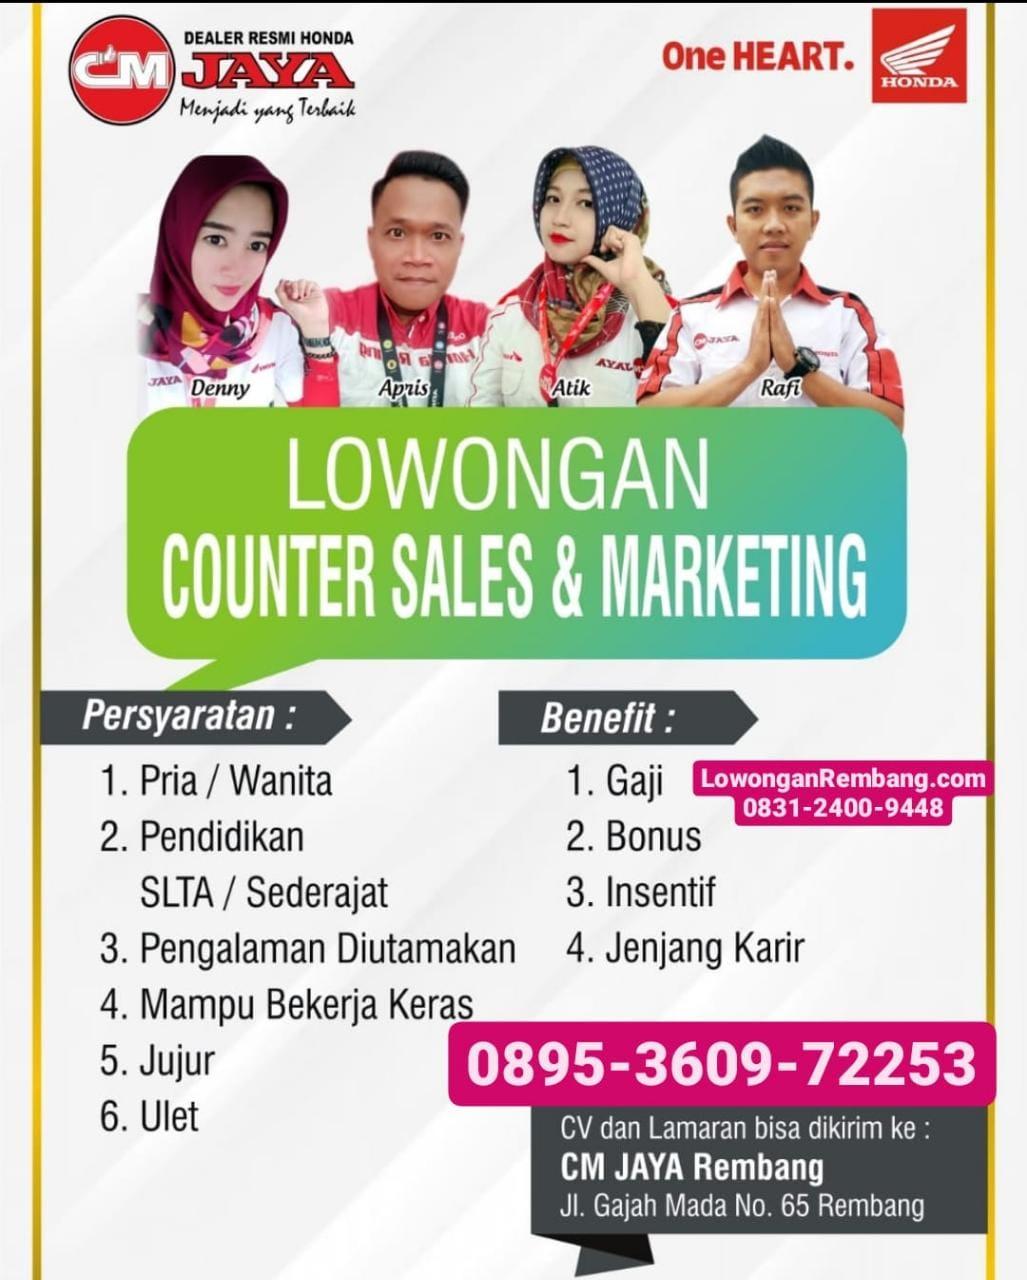 Lowongan Kerja Counter Sales Dan Marketing CM Jaya Honda Rembang Dapat Gaji Bonus Insentif